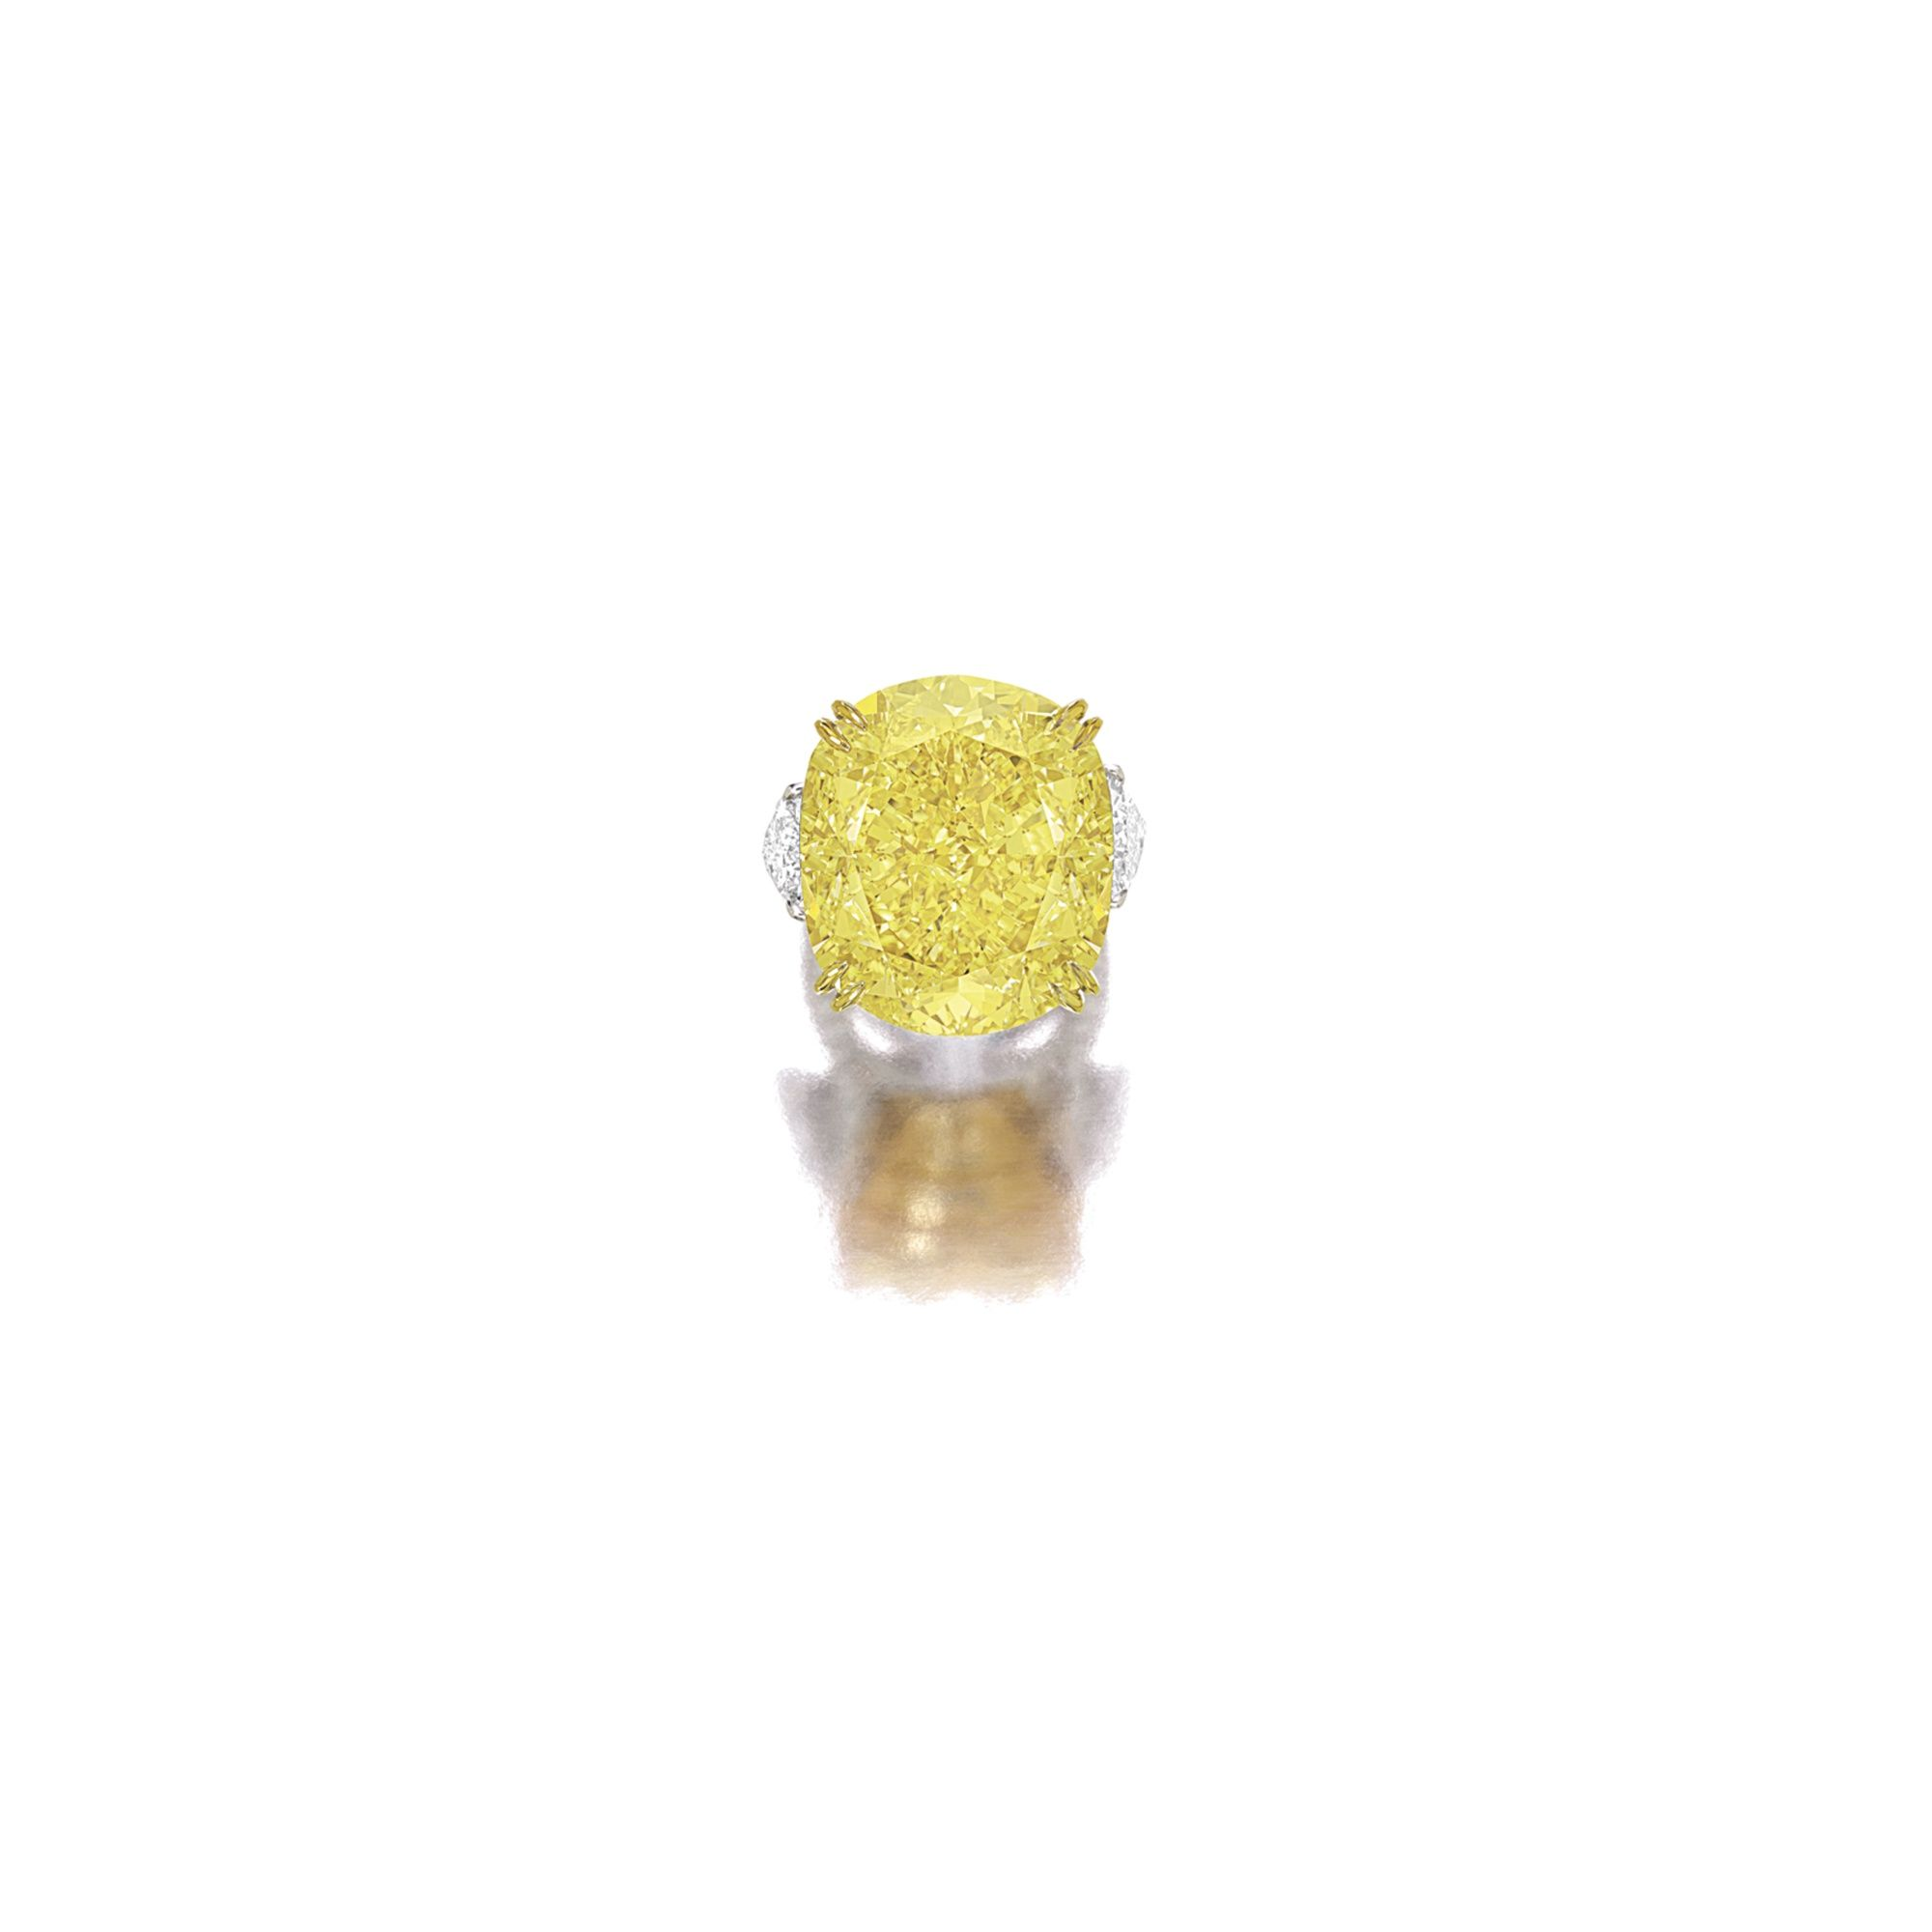 Impressive FancyVivid Yellow Diamond and Diamond Ring/Pendant | Lot | Sotheby's